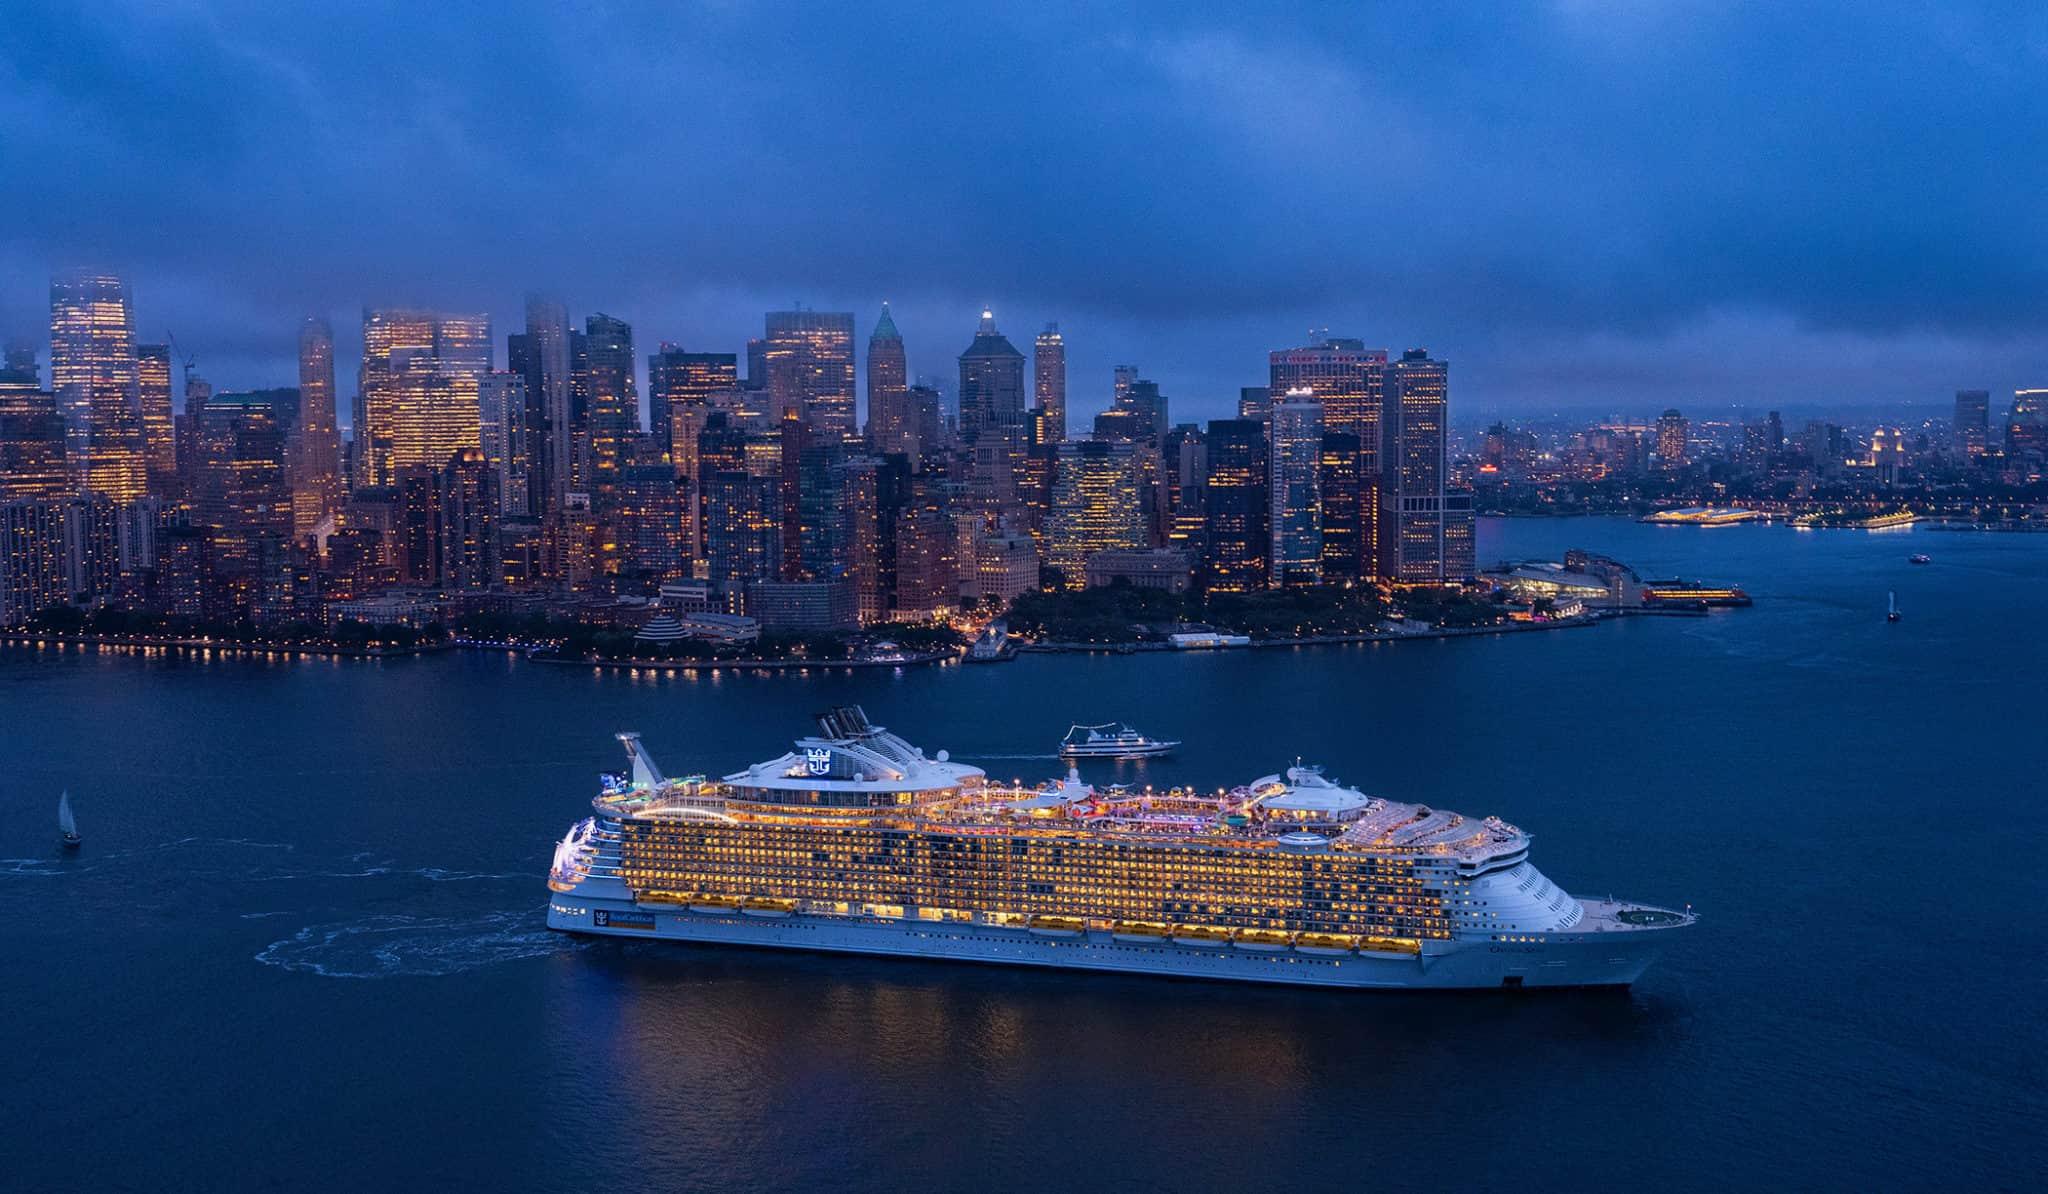 oasis of the seas new york city